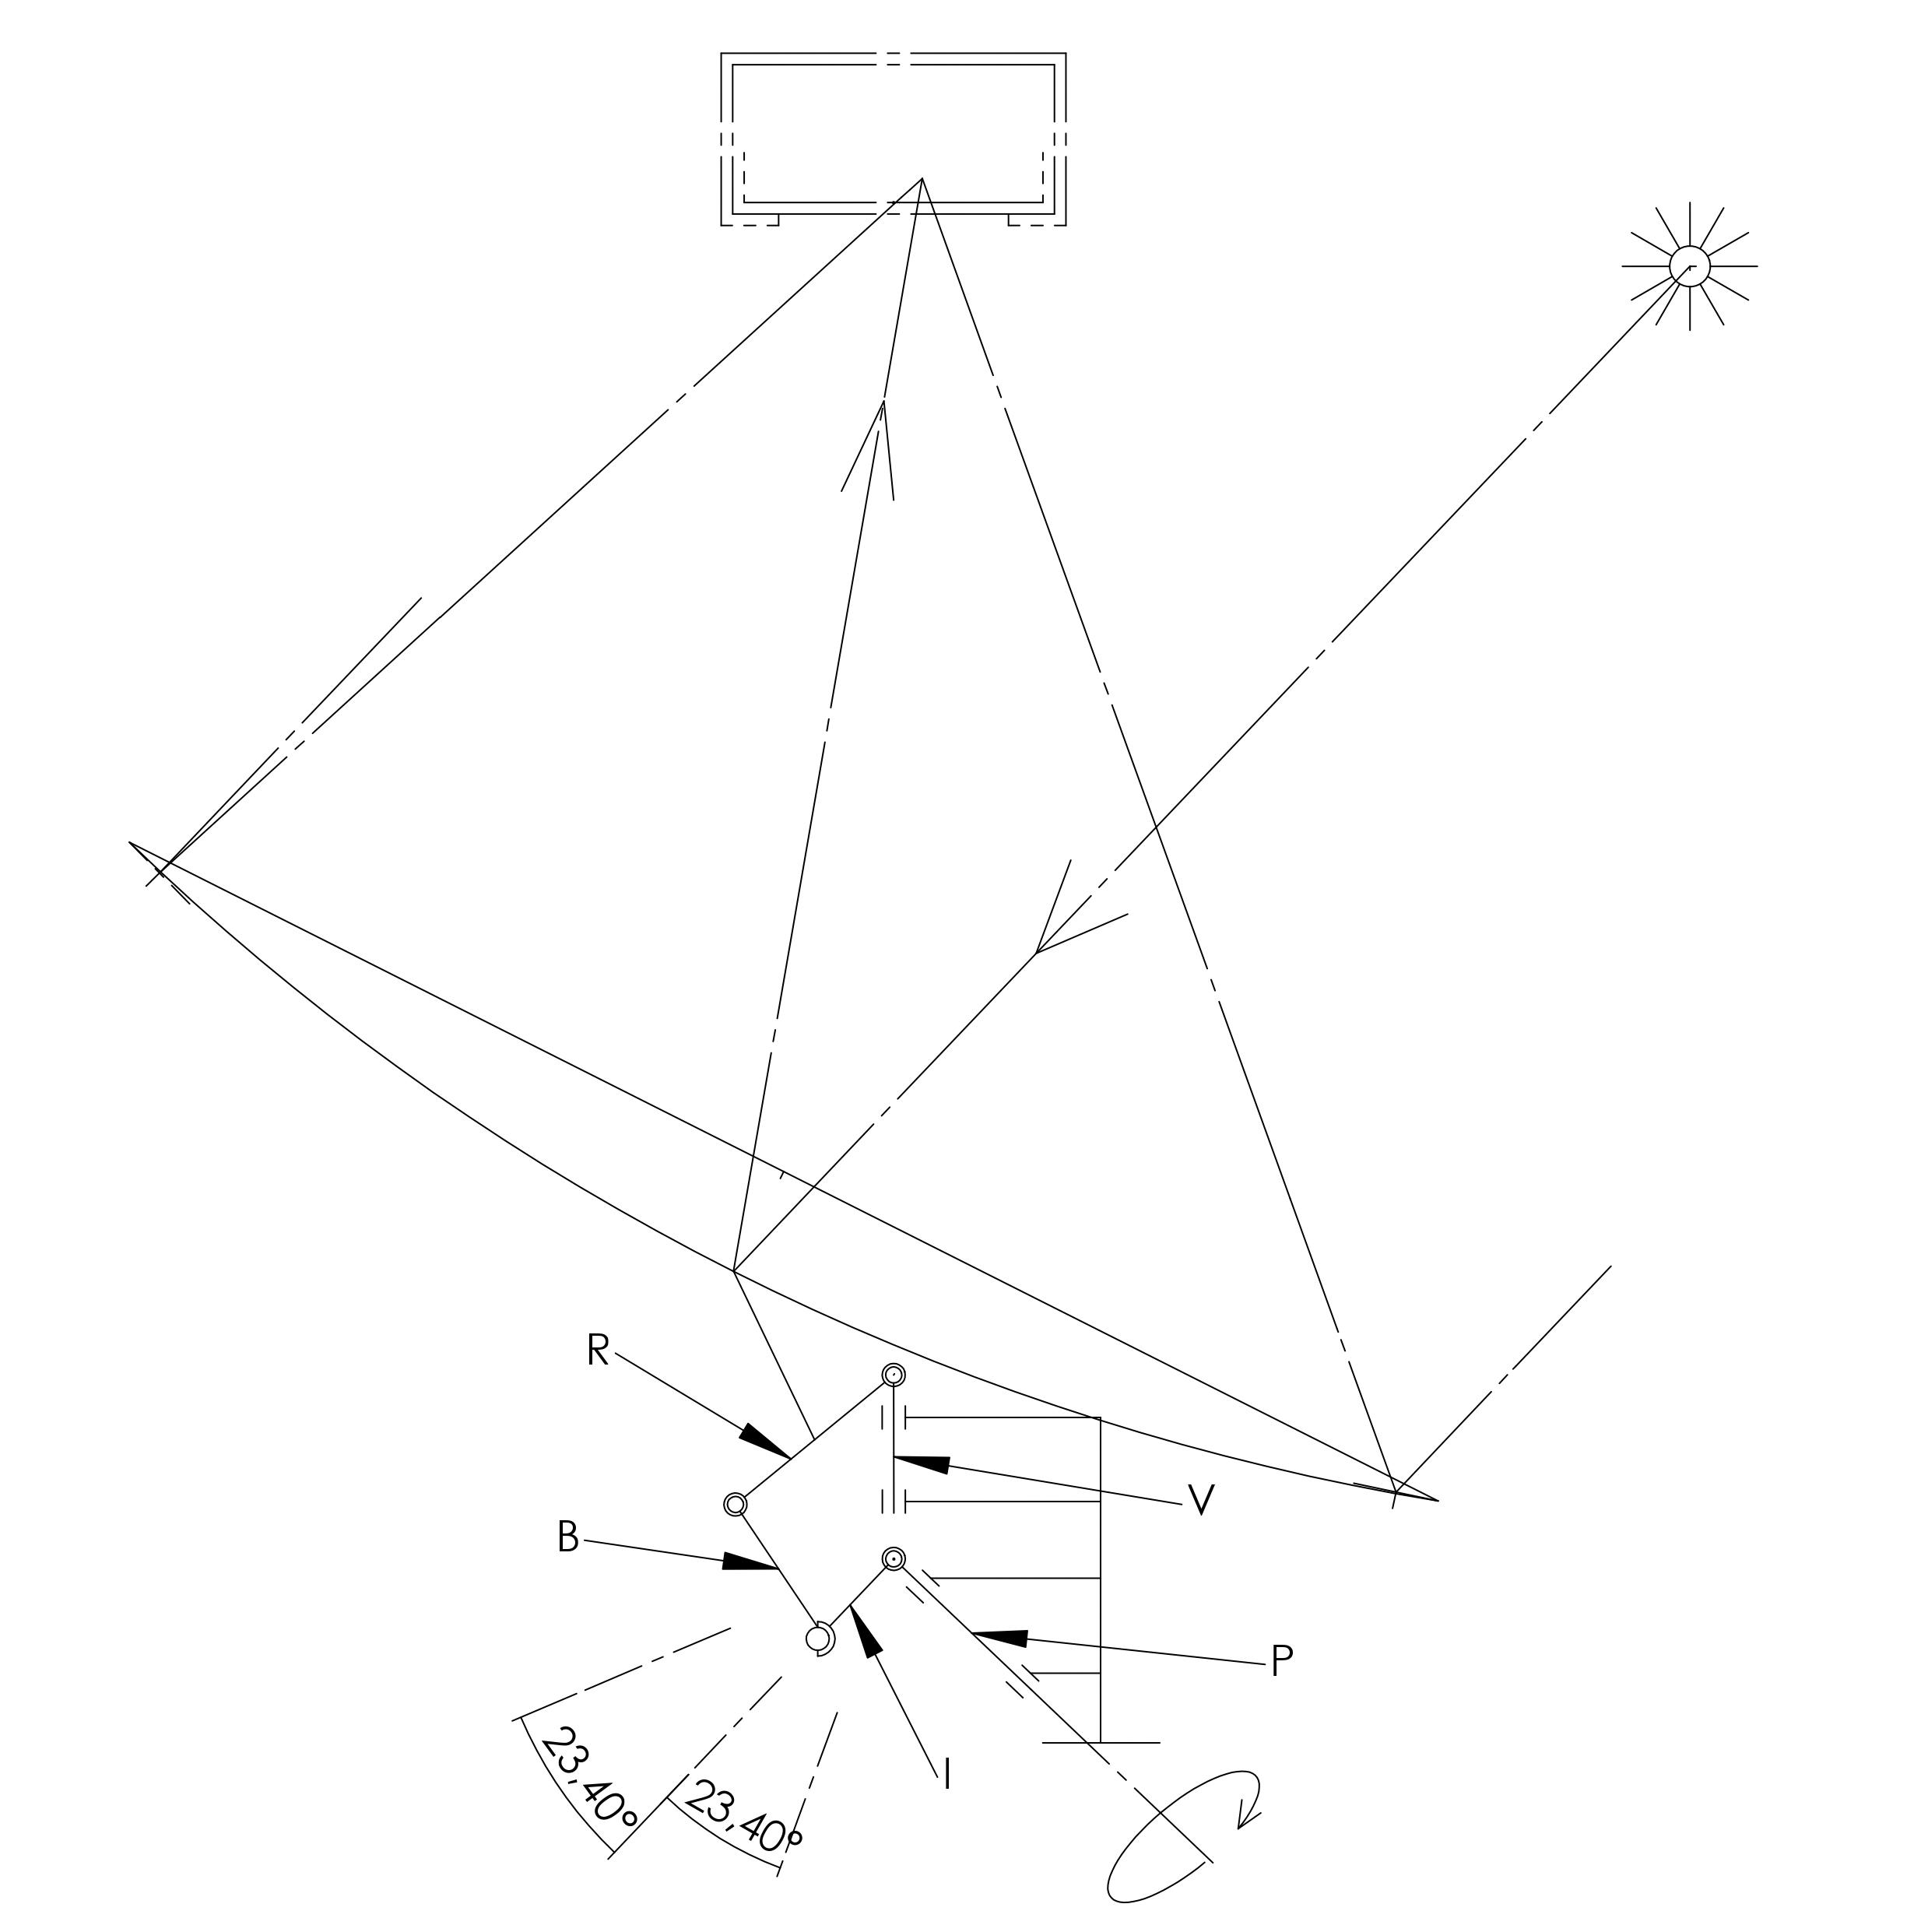 schéma mécanisme parallélogramme